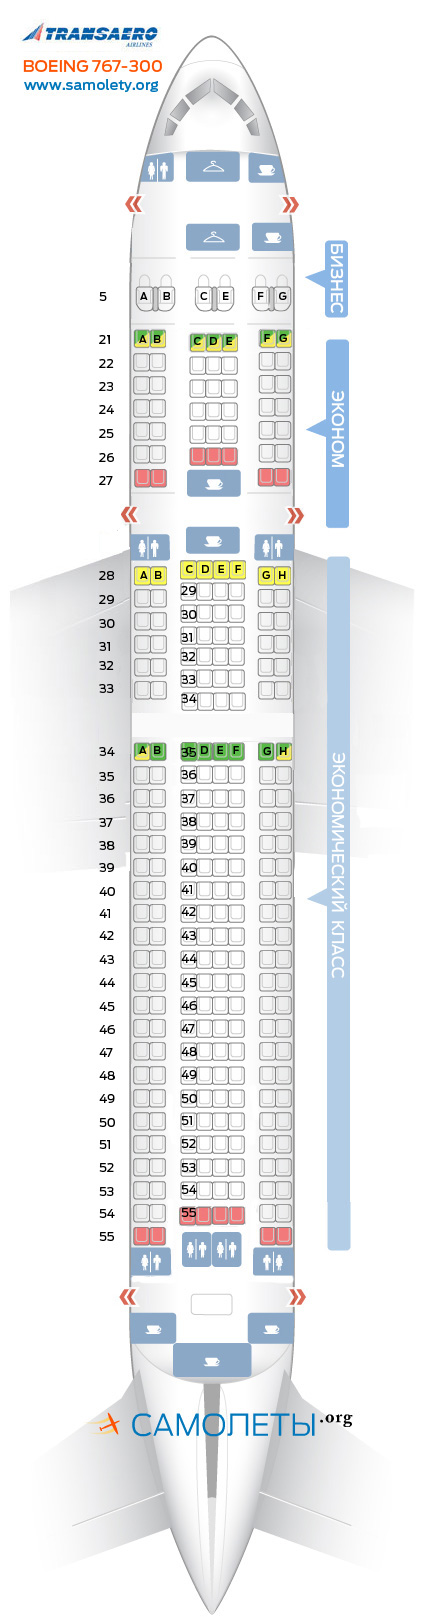 боинг 767 300 схема салона лучшие